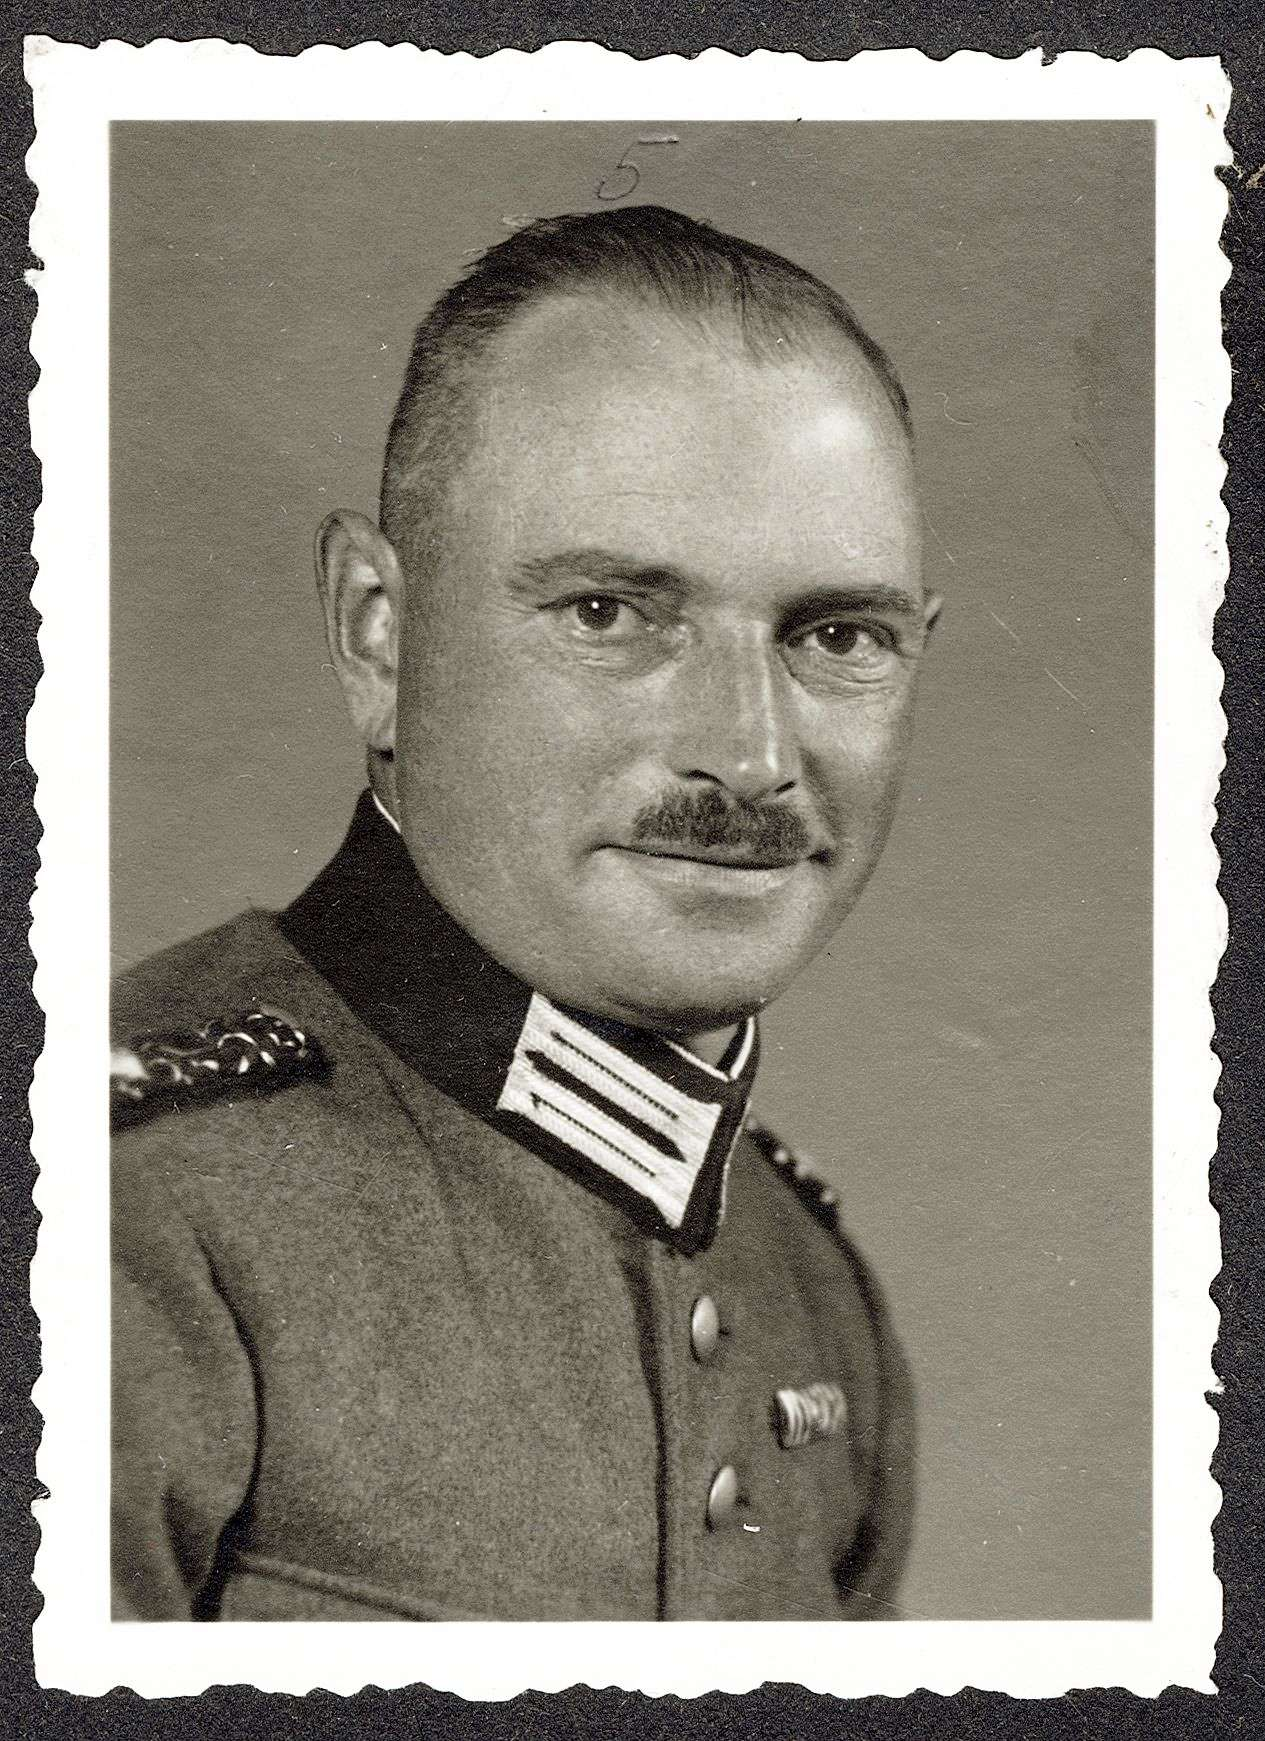 Hummel, Reinhold, Bild 1